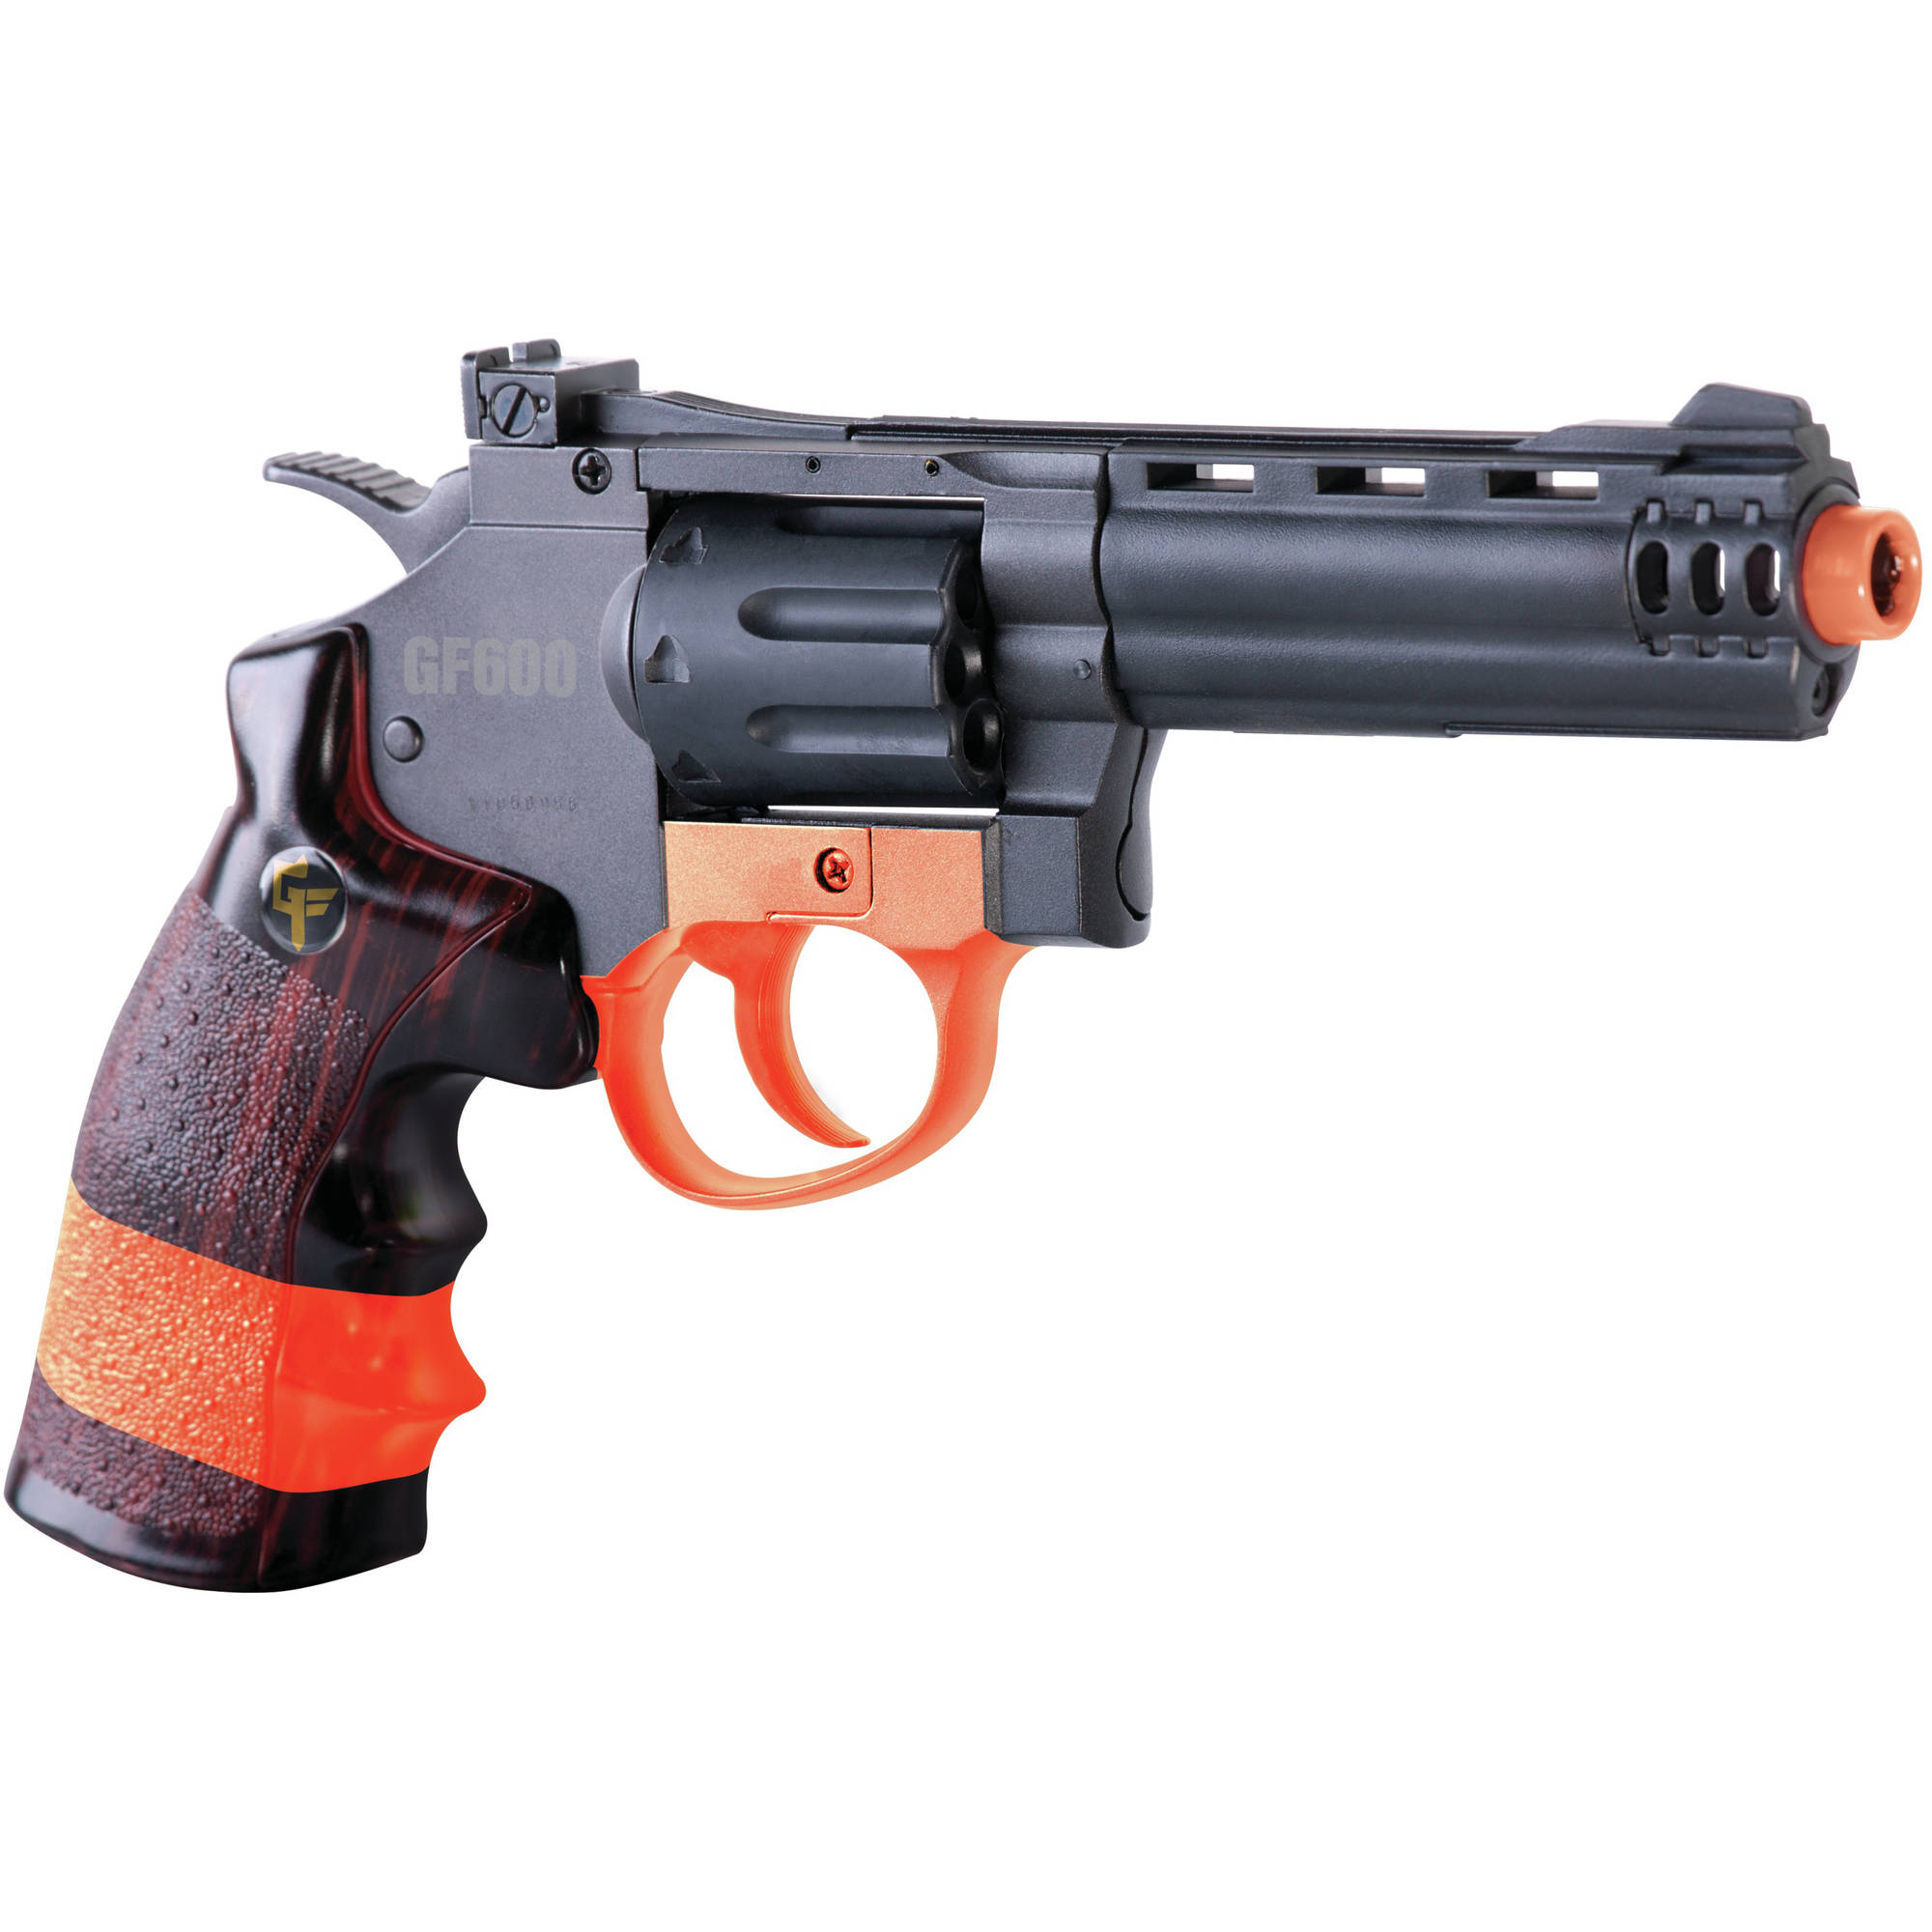 Crosman Game Face Revolver GF600 Airsoft Pistol, California Compliant by